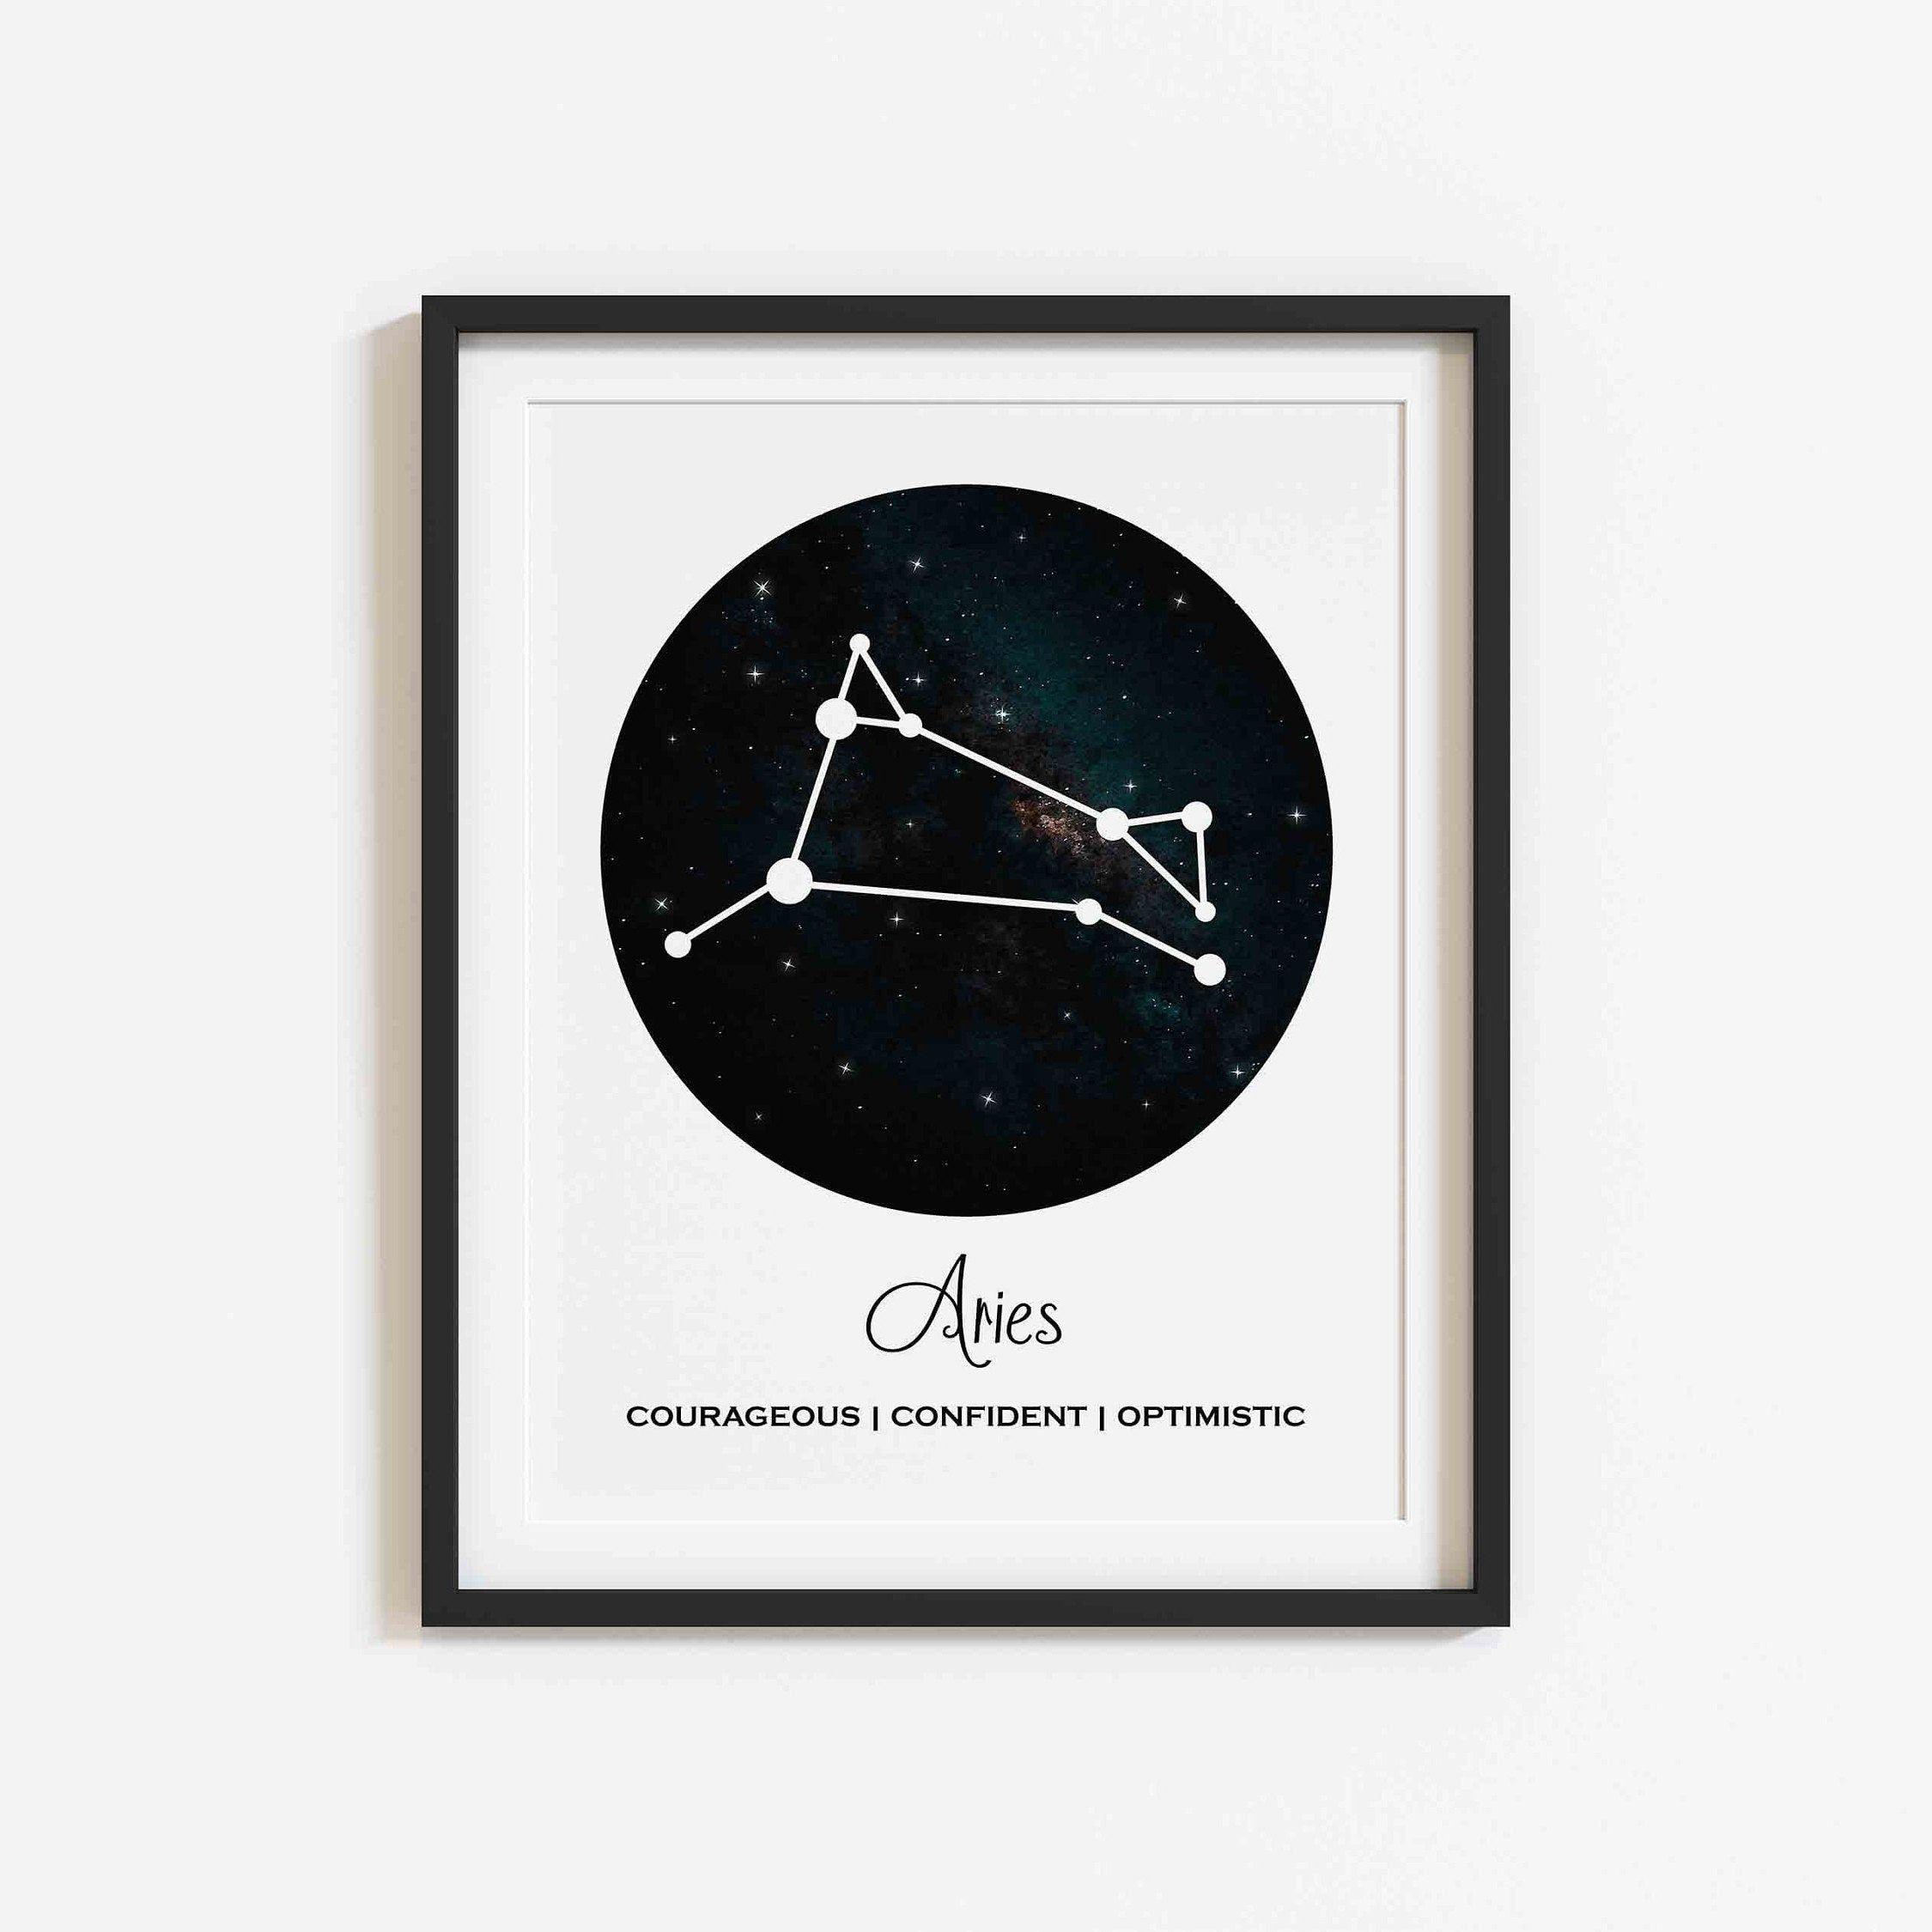 Aries Print Zodiac Wall Art Aries Zodiac Star Sign Print Astrology Wall Art Celestial Print Constellation Print Zodiac Sign Astrology Sign Printing Constellation Print Star Signs